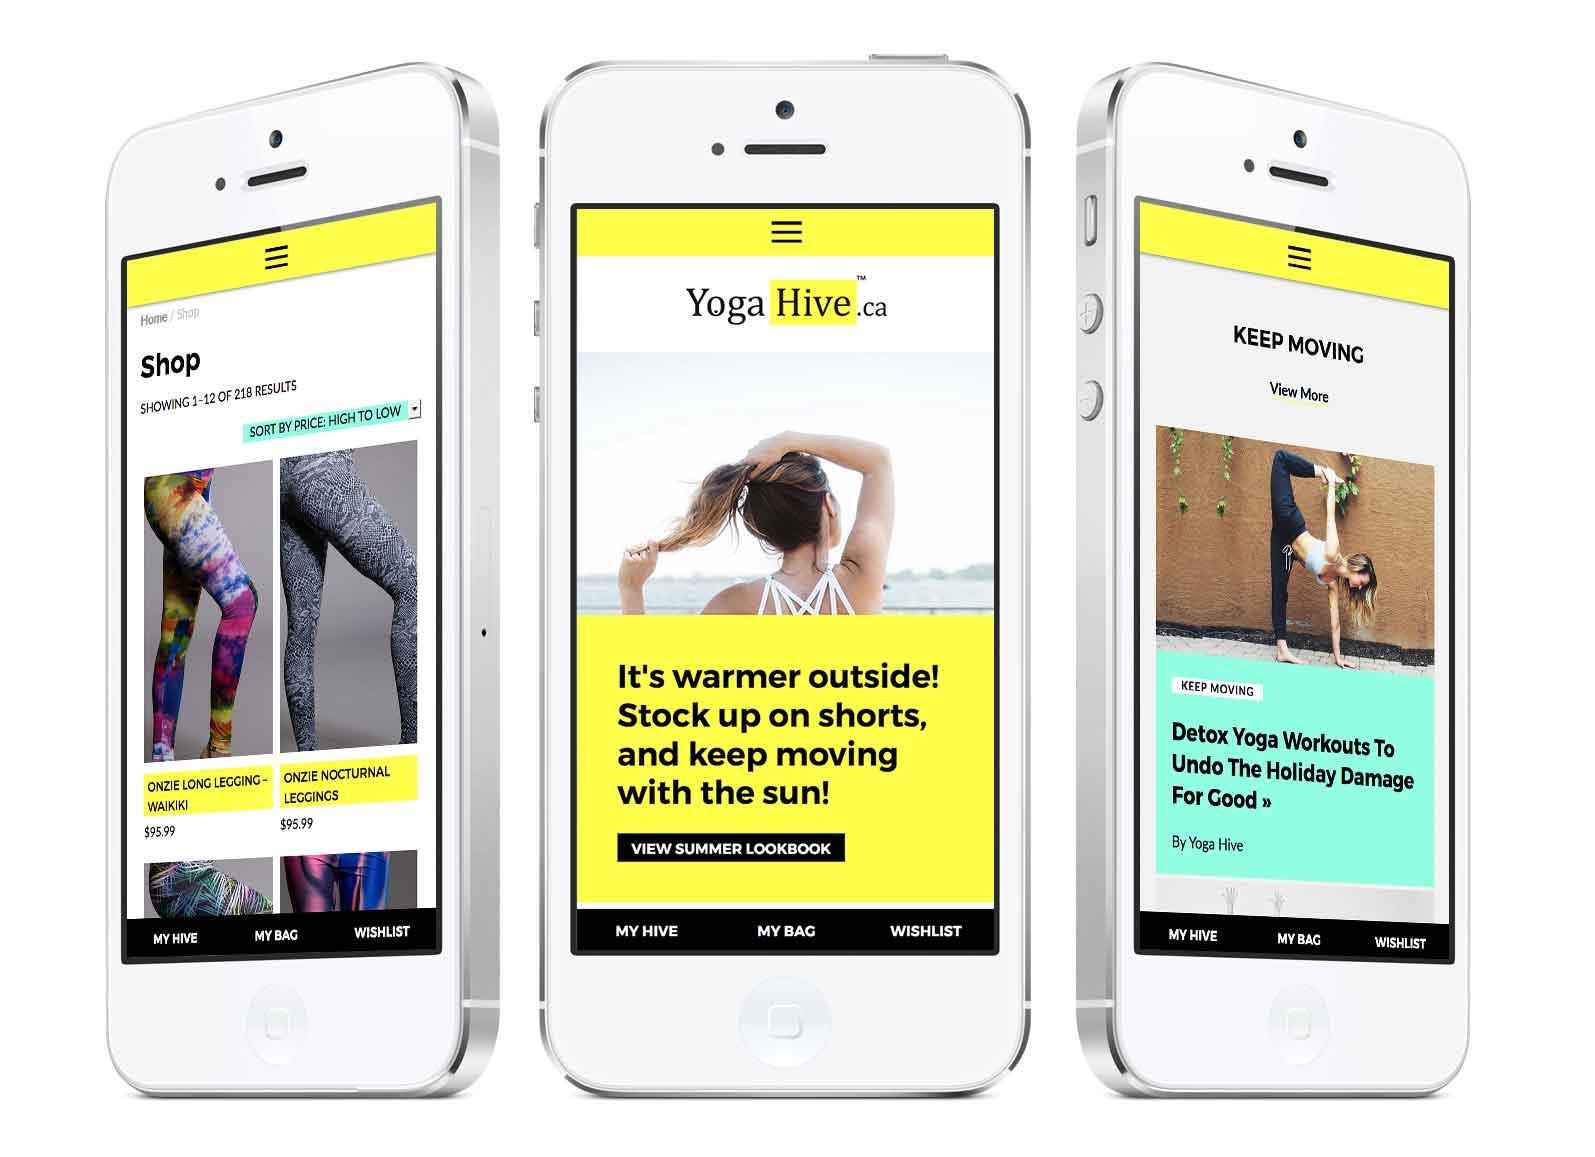 yogahive-phone - web design case study